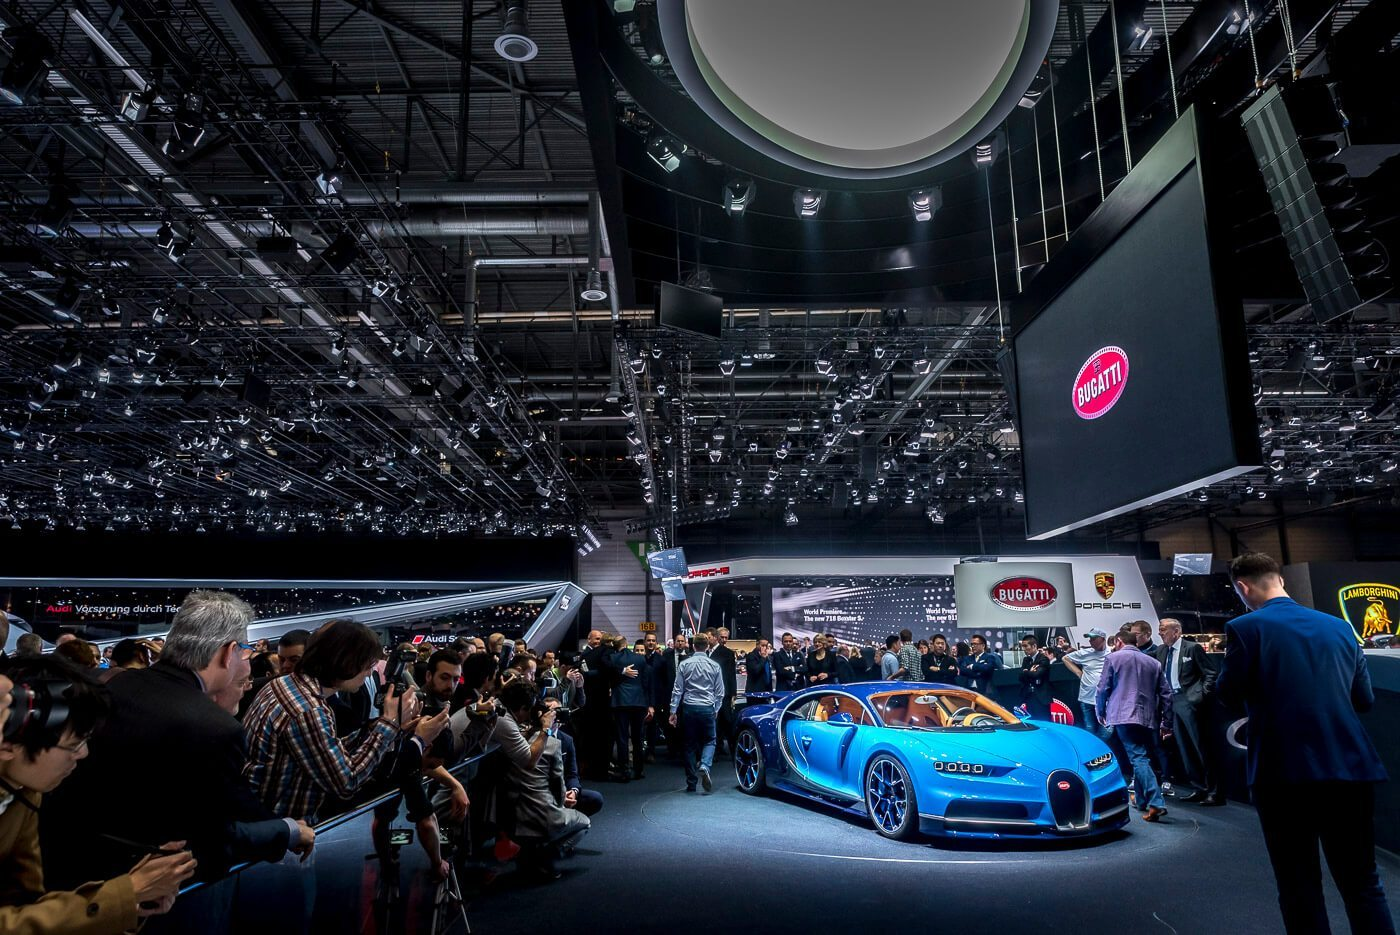 Bugatti Chiron - Hartvoorautos.nl